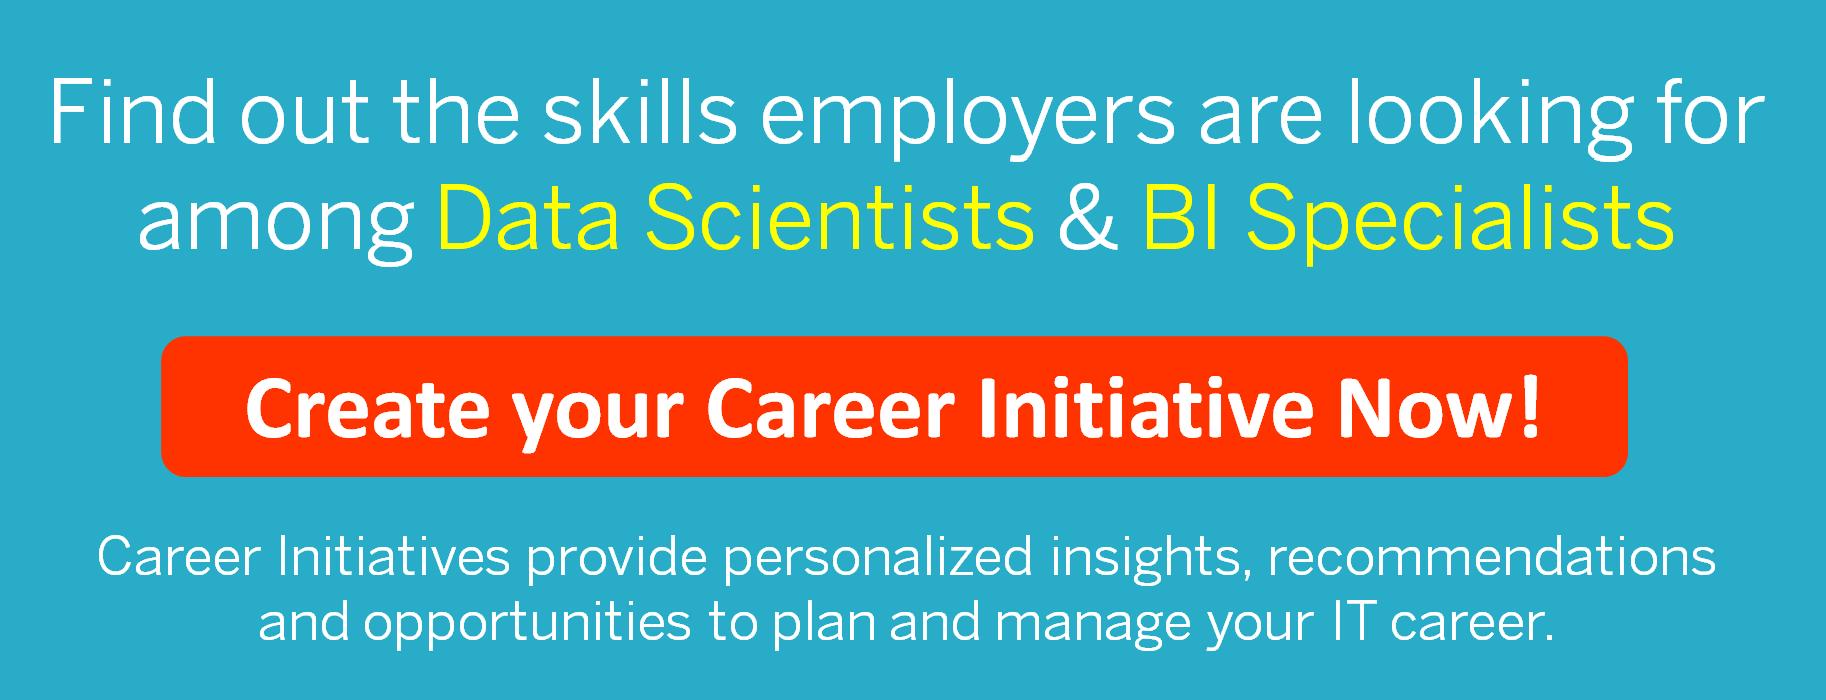 BI Specialist or Data Scientist? - Image 3